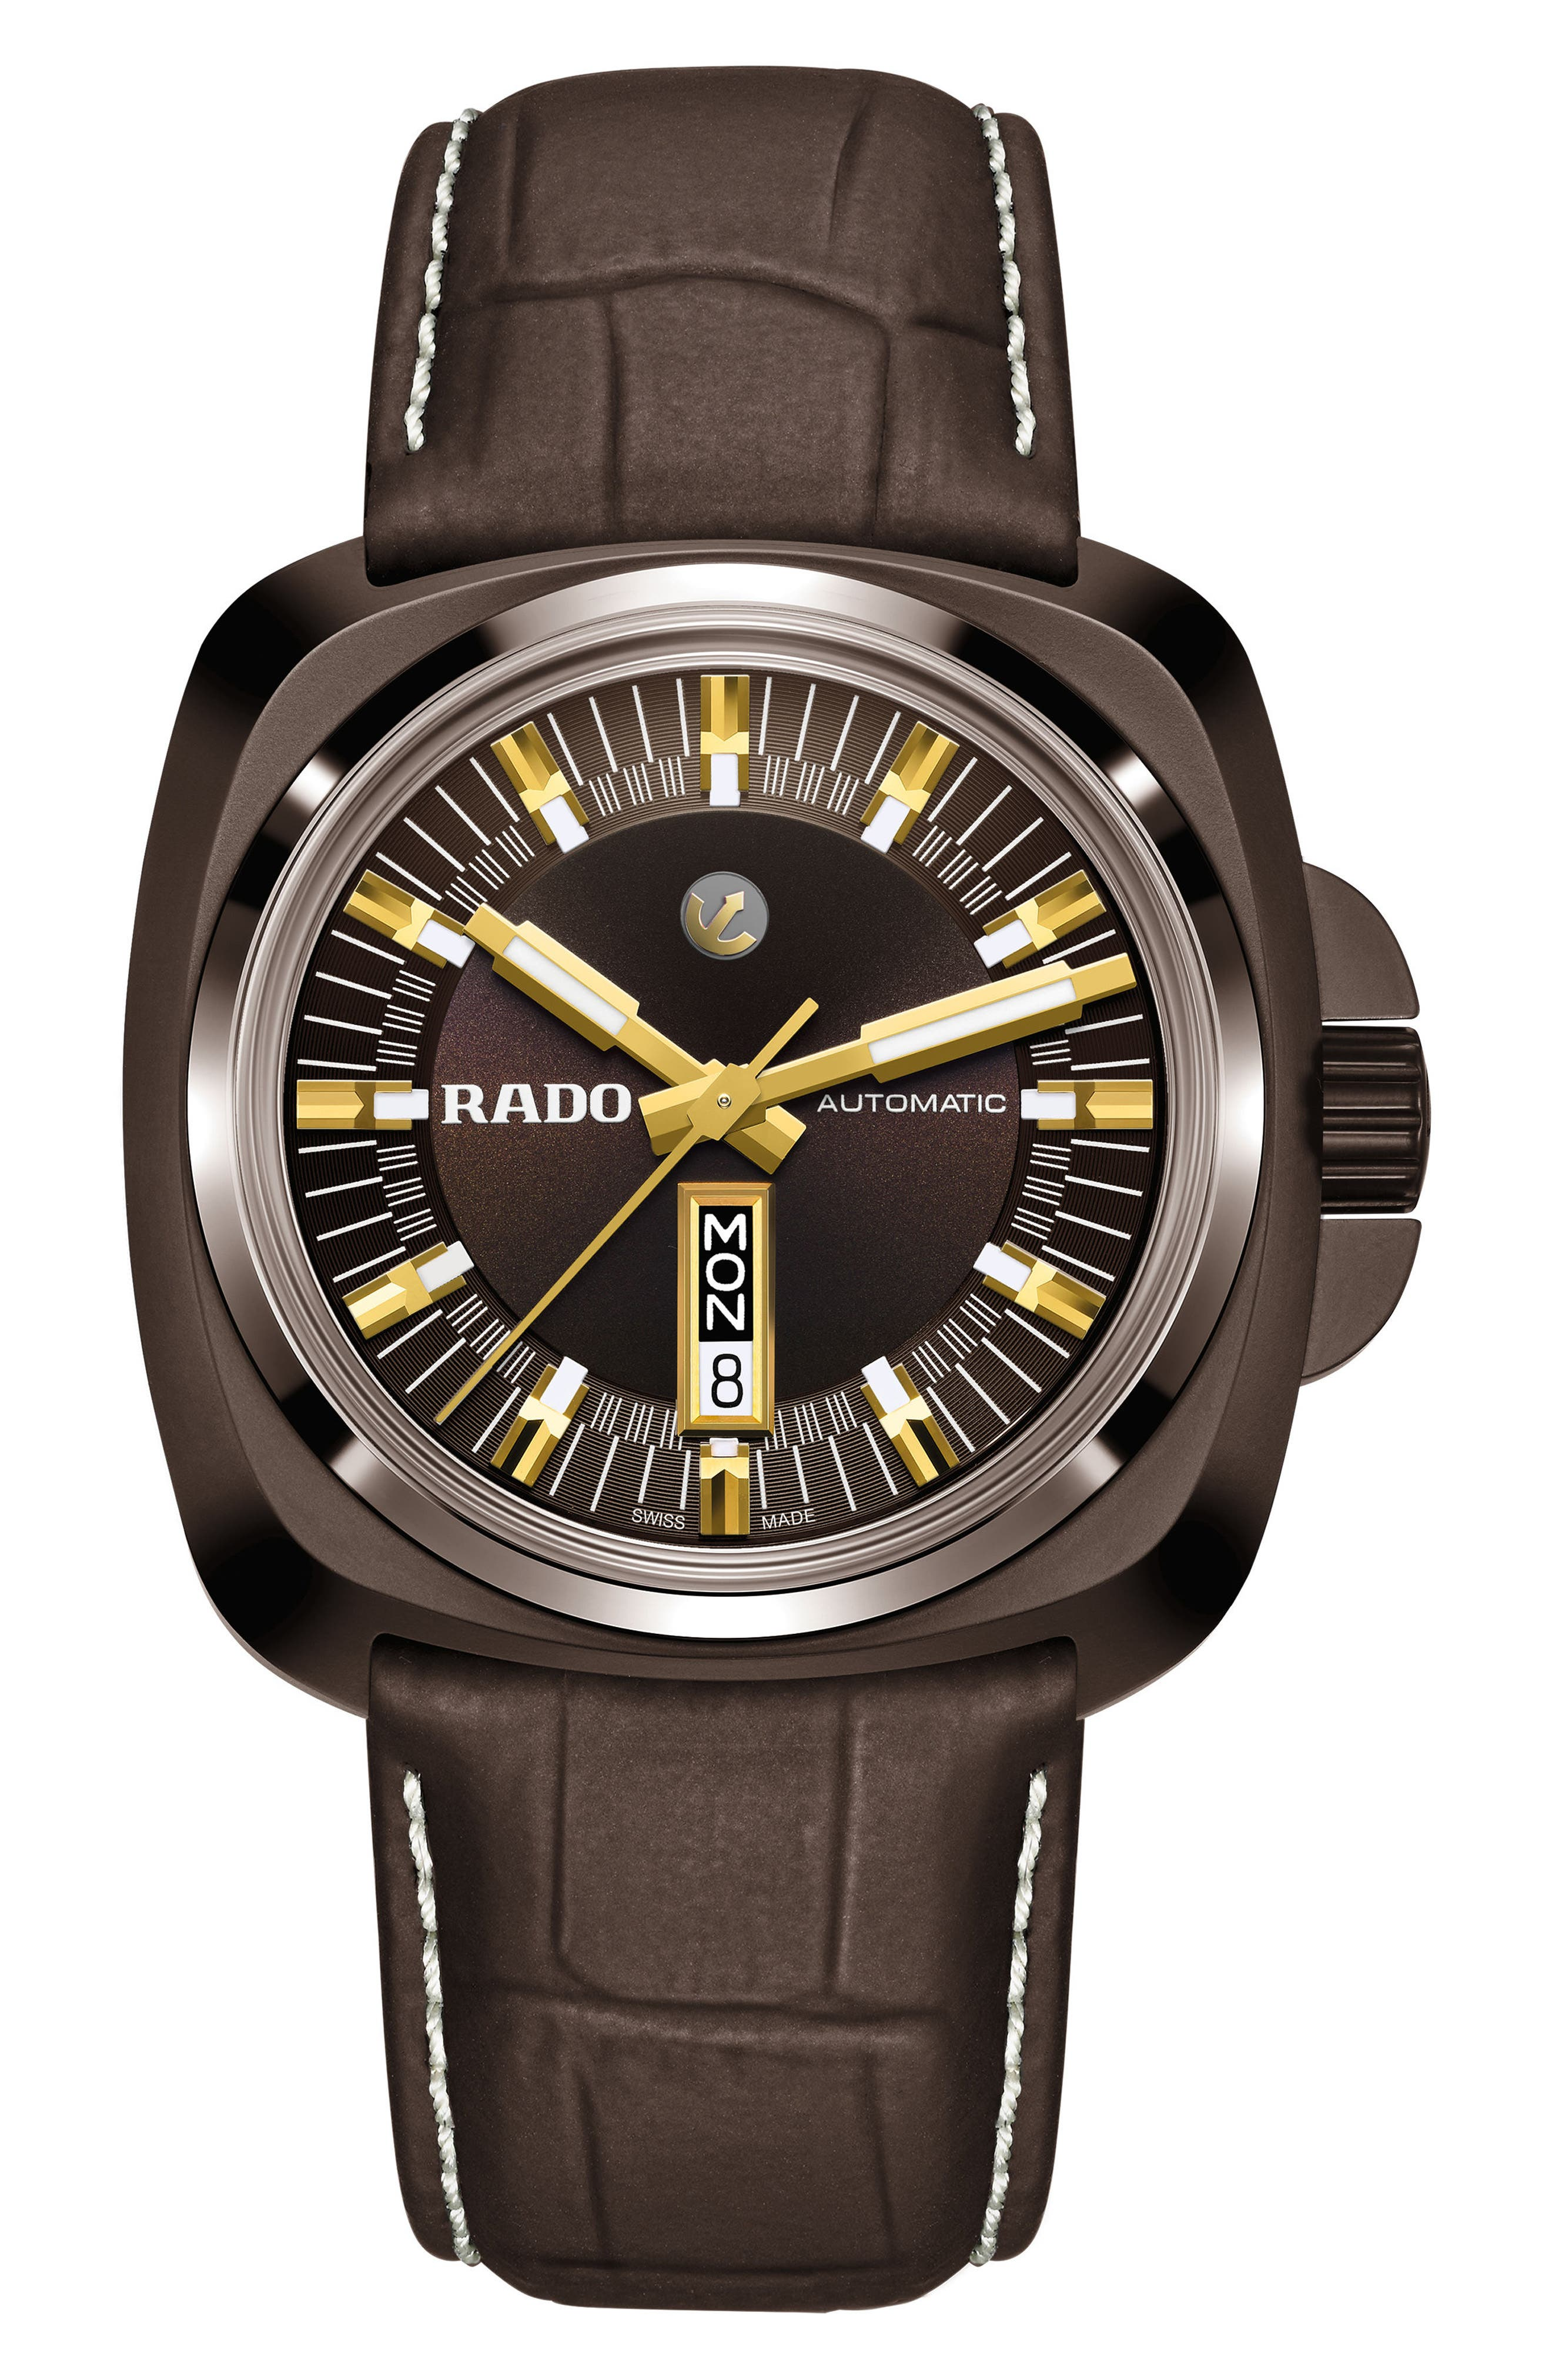 RADO HyperChrome 1616 Automatic Leather Strap Watch, 46mm